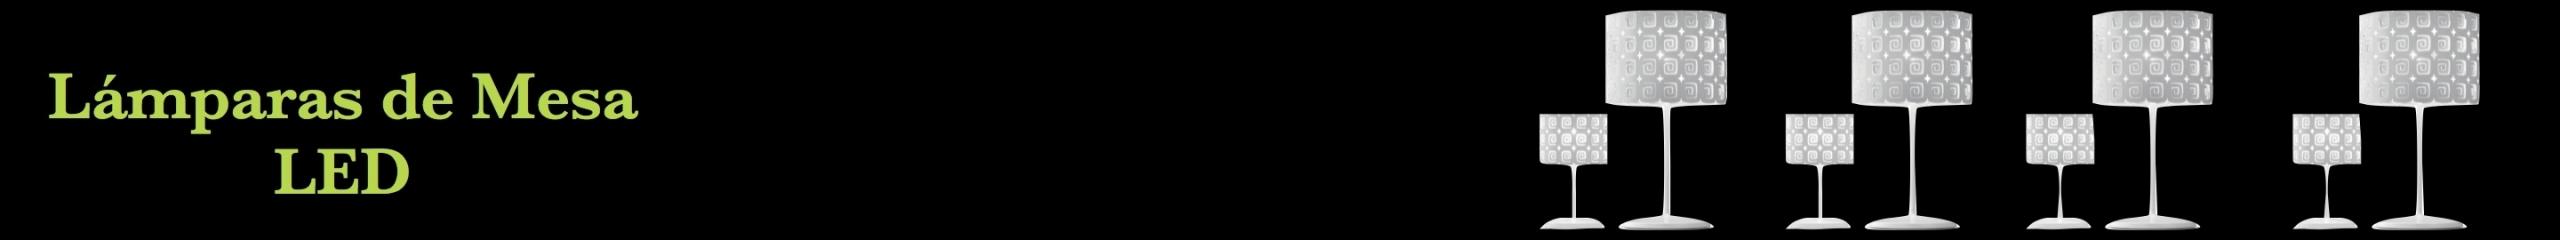 Lamparas de Mesa LED